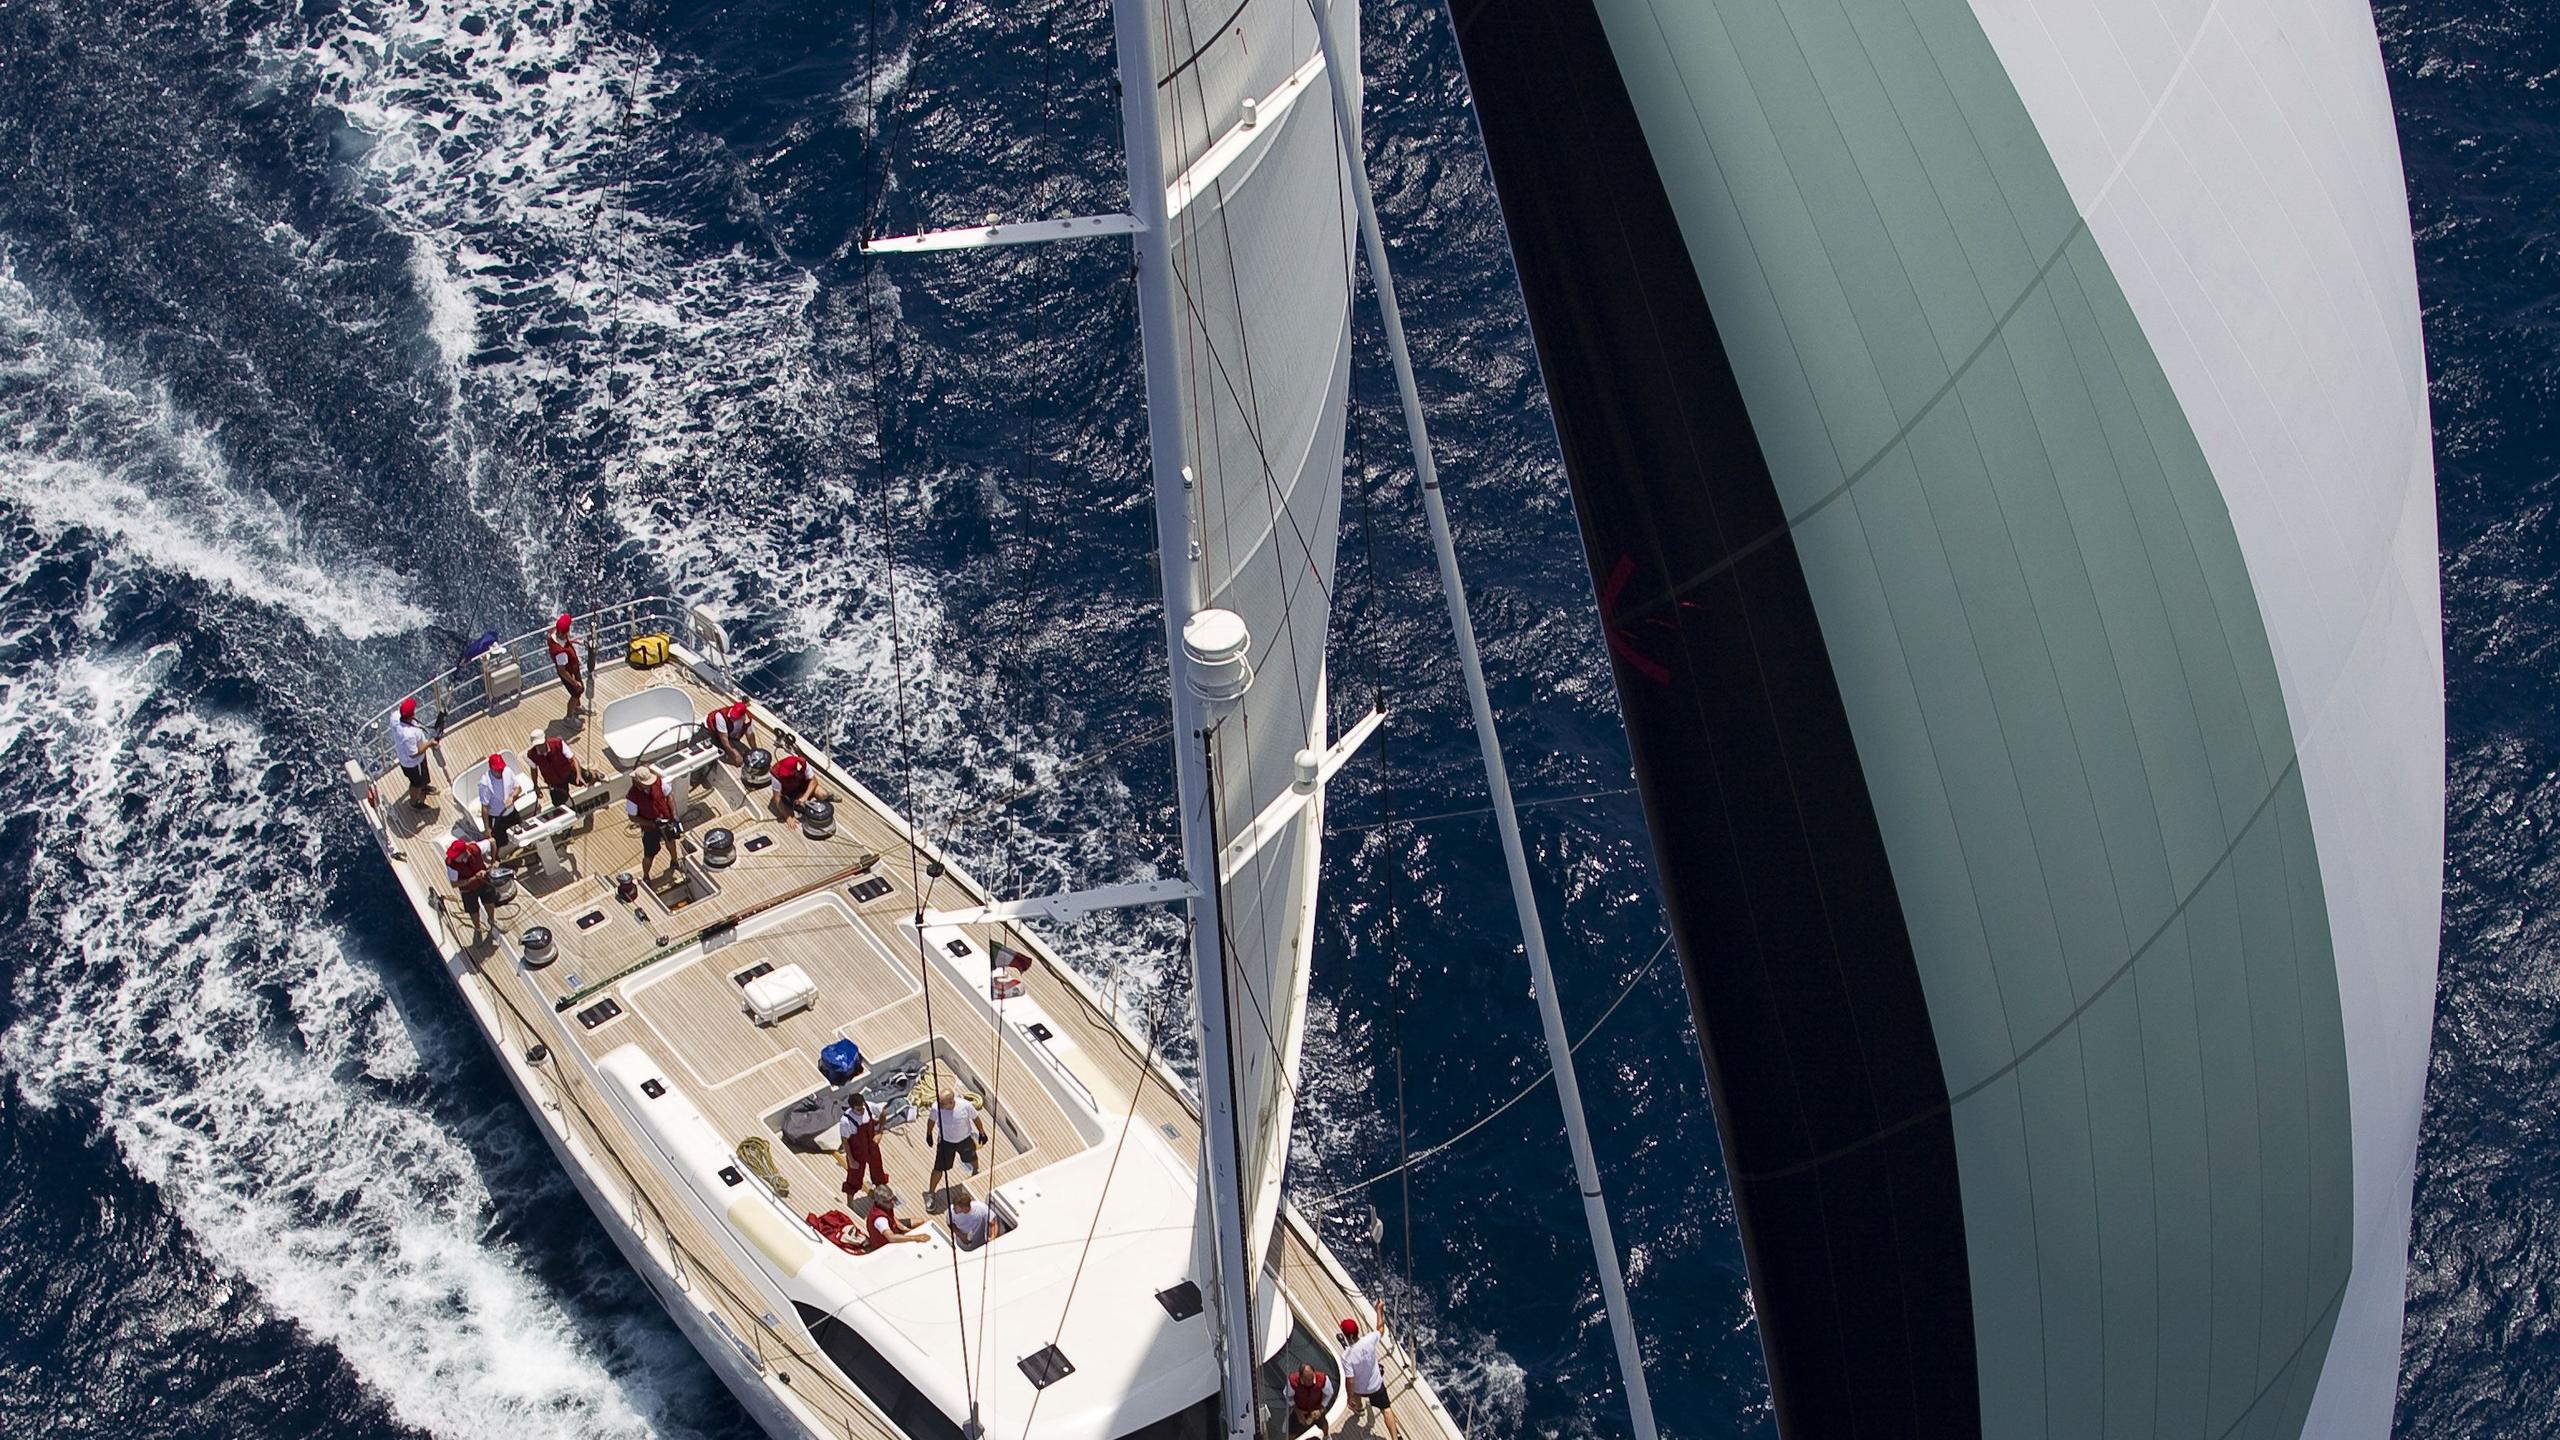 I Sea sailing yacht aerial